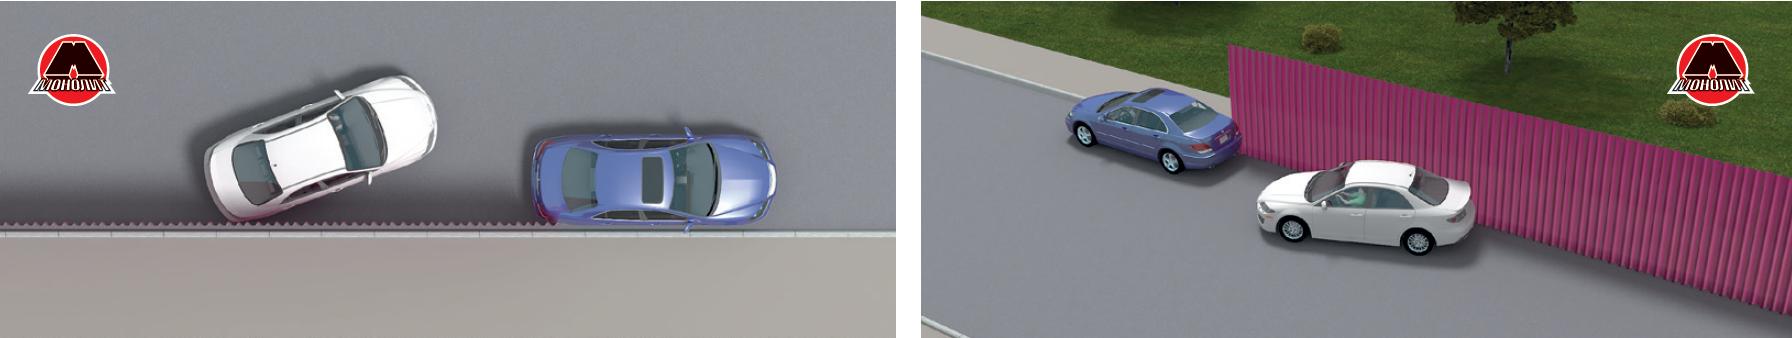 Ориентир парковки штора